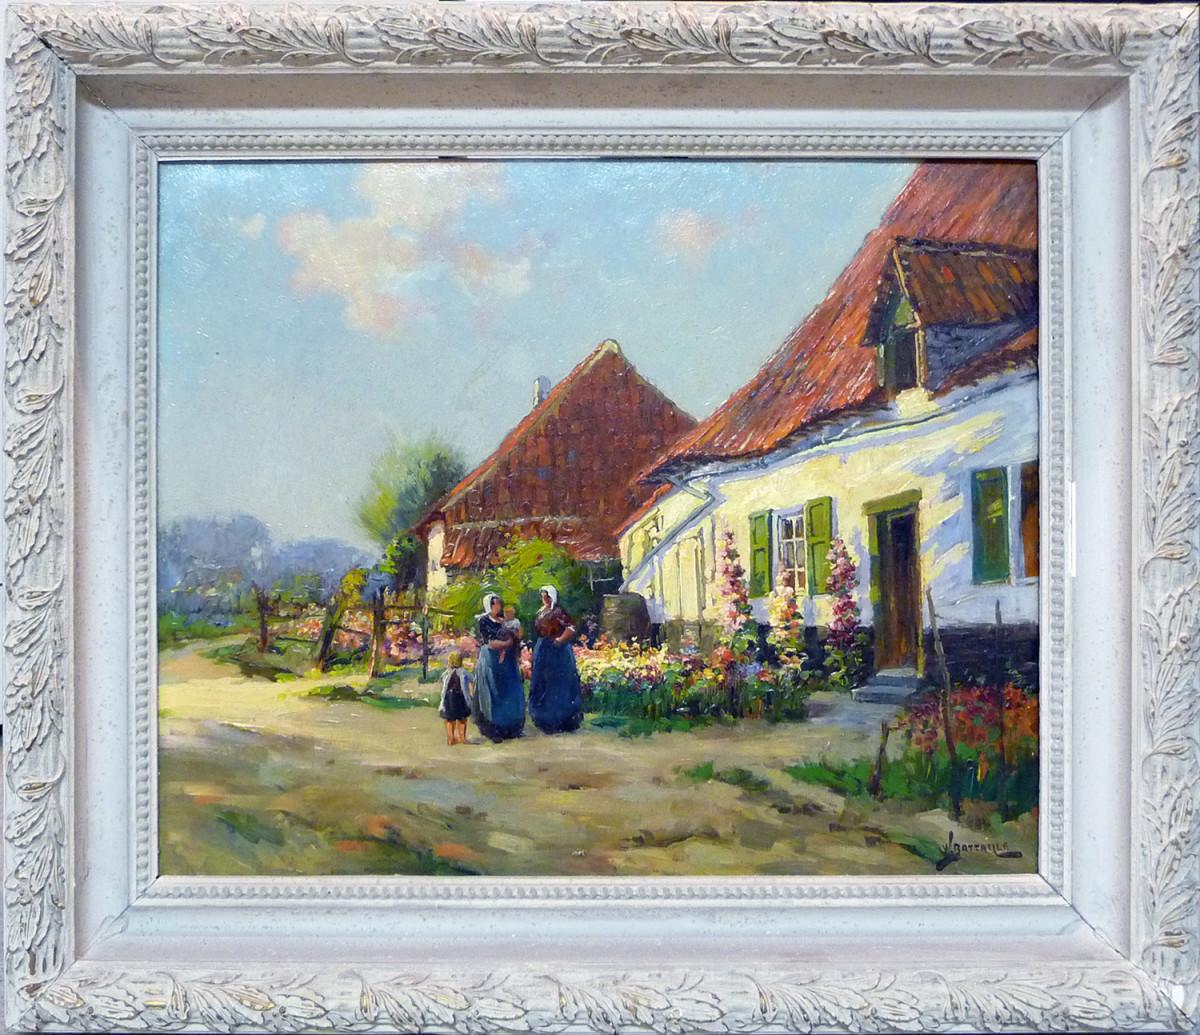 0015 - Maison de Frecheure by Willem Battaille (1867-1933)